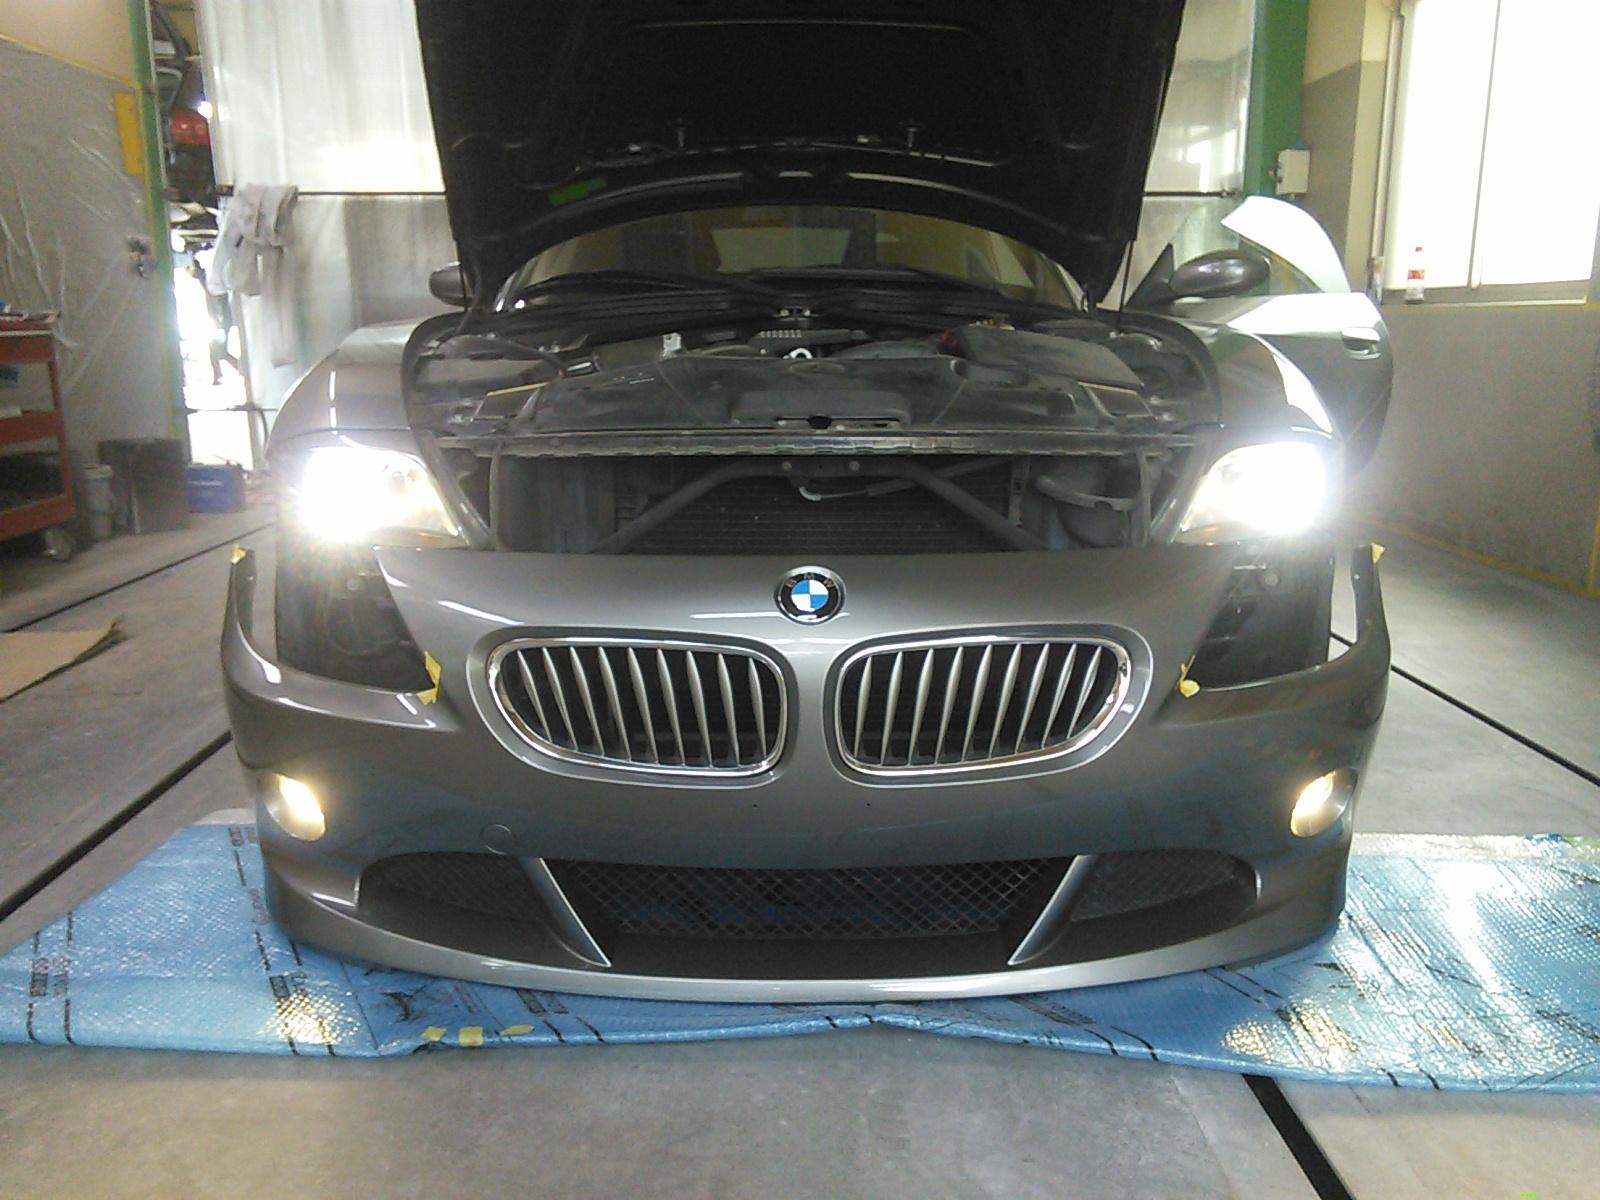 BMW Z4 フロントバンパー修理 予定外の割れ修理 豊田市 板金塗装